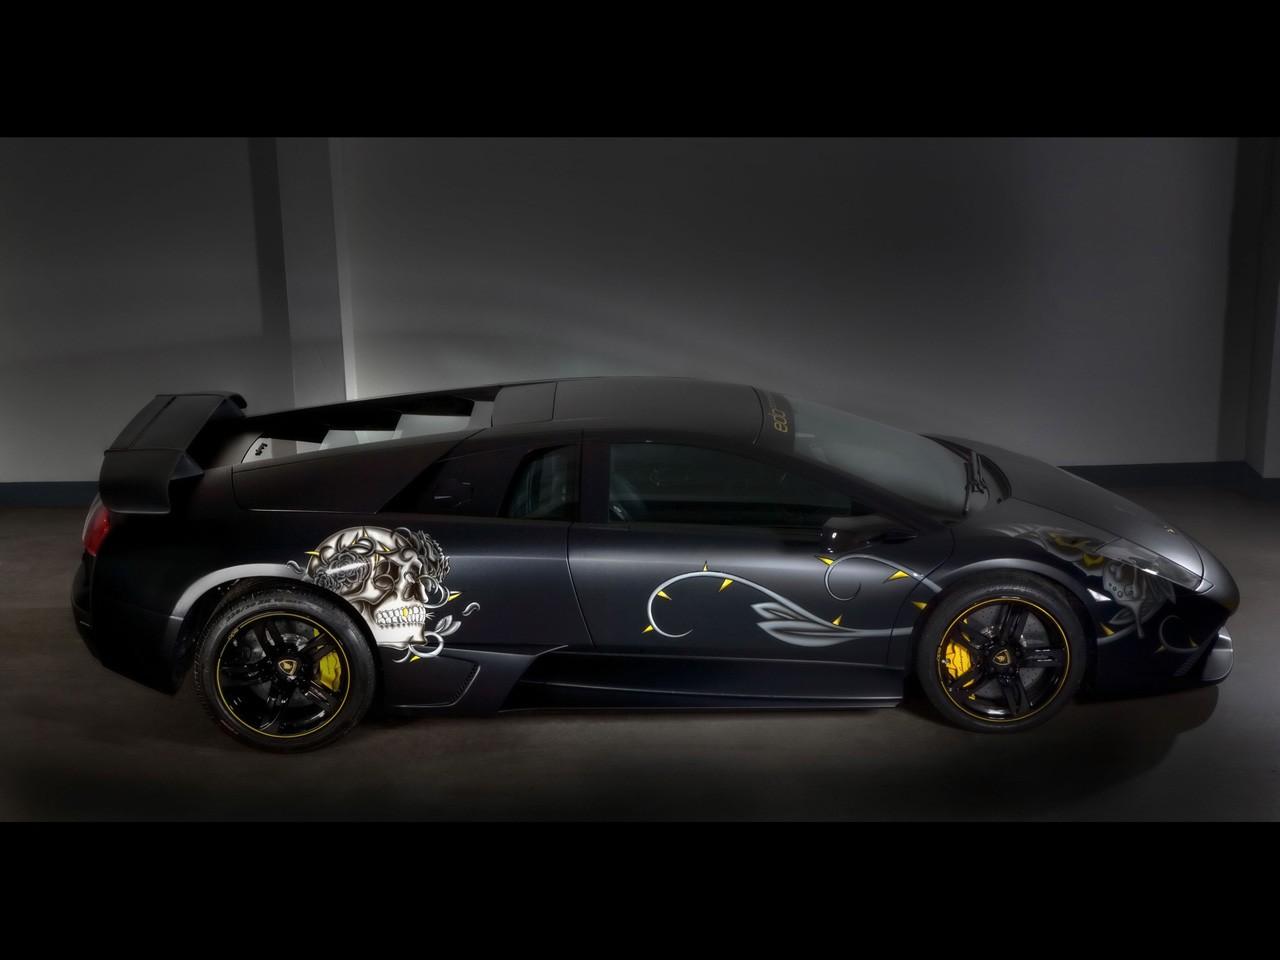 2009 Edo Competition - Lamborghini LP710 Audigier Limited Edition